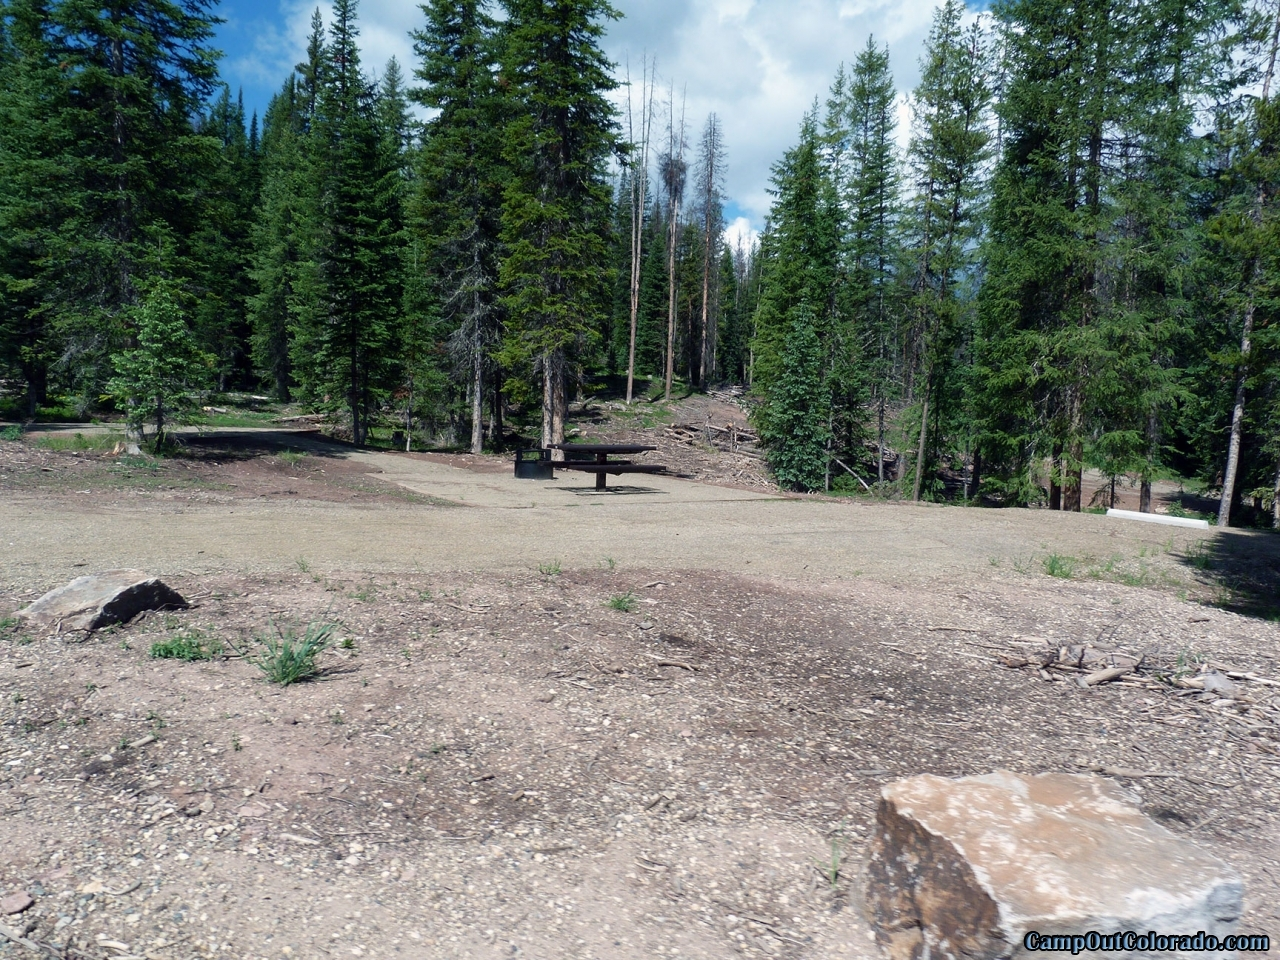 hahns-peak-lake-campground-thick-forest-around-campsite